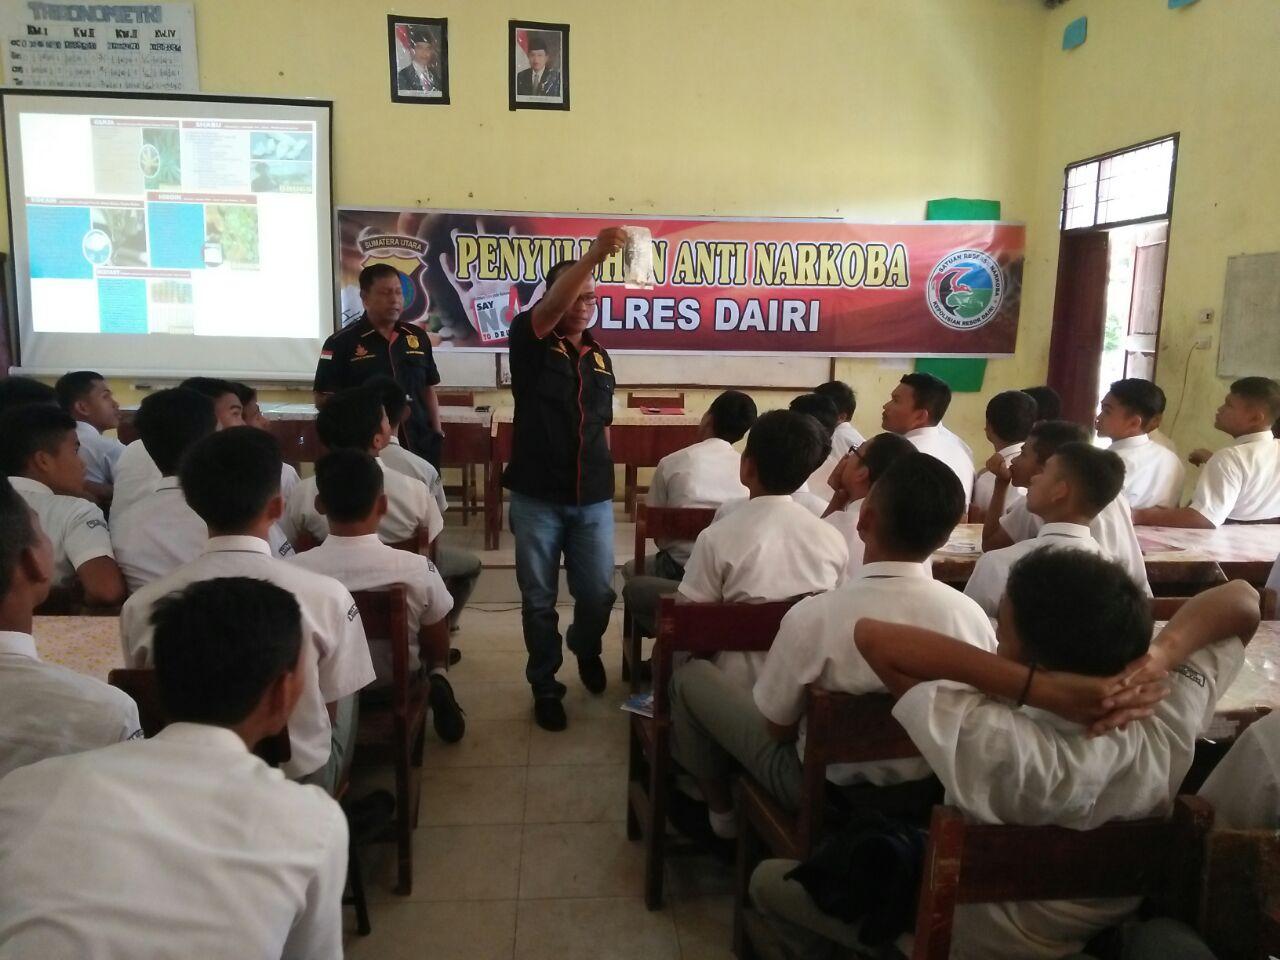 POLRES DAIRI GELAR PENYULUHAN INDONESIA DARURAT NARKOBA DI SMAN 2 SIDIKALANG